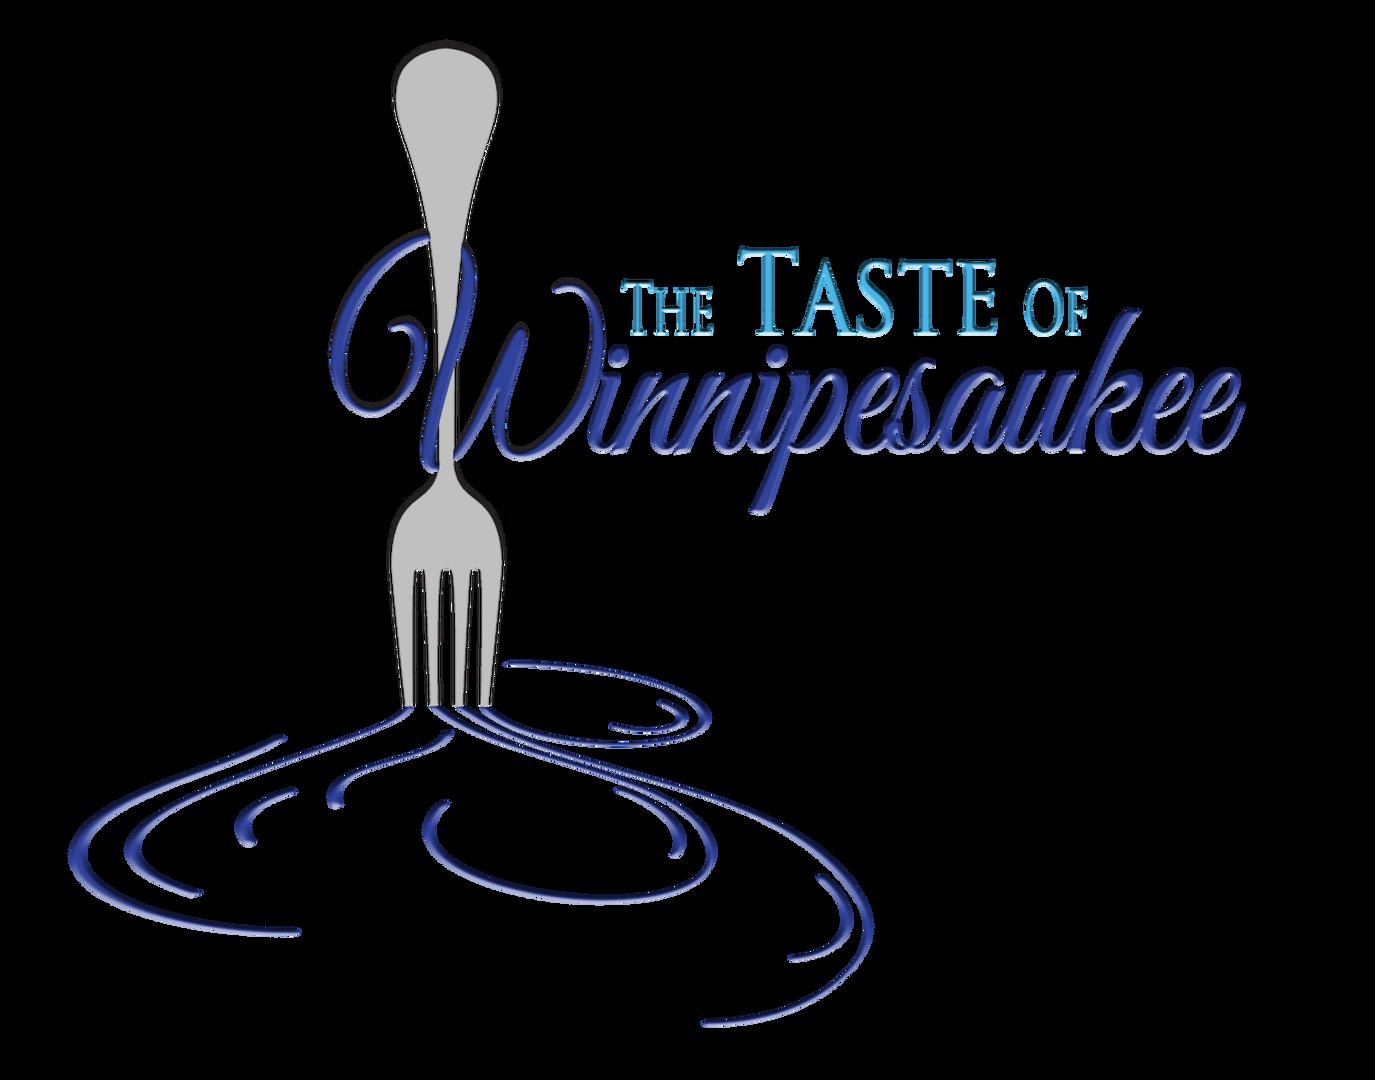 The Taste of Winni.png